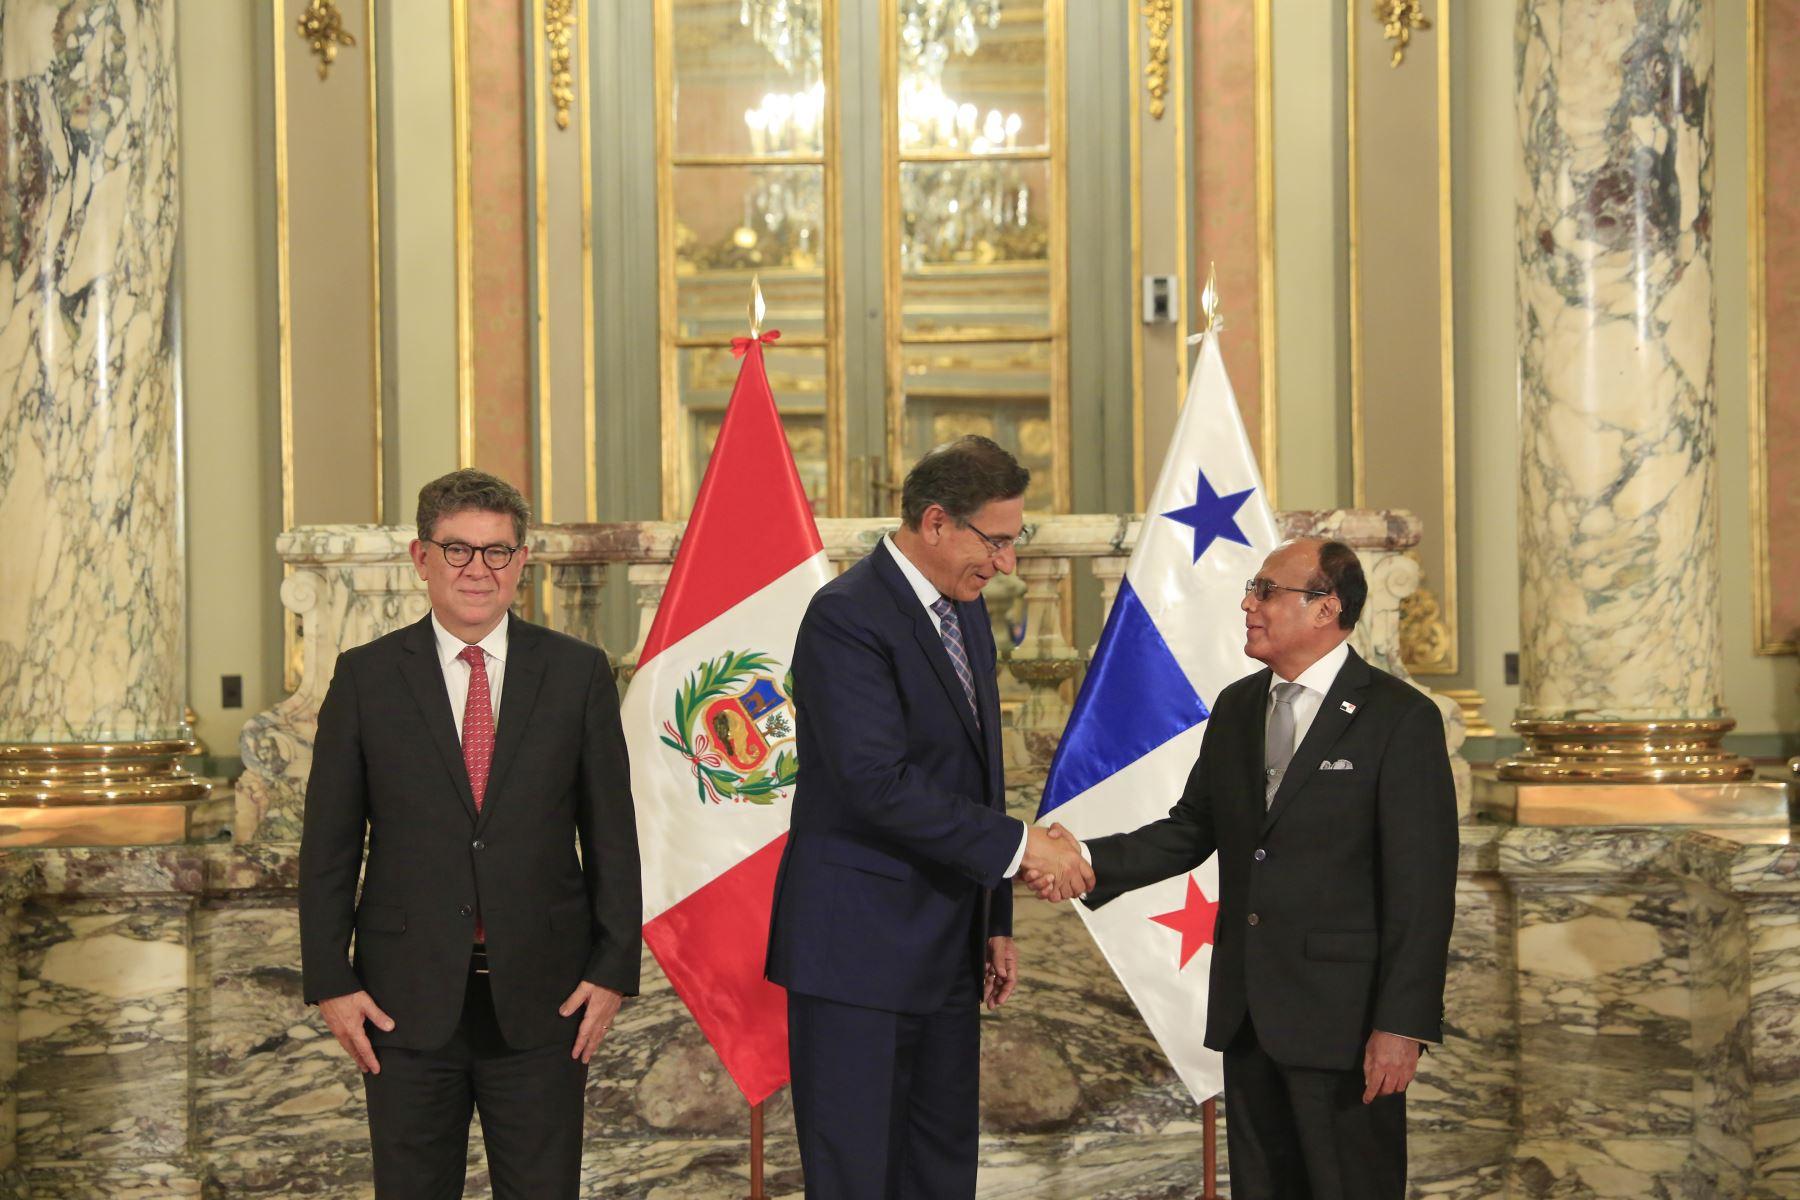 Presidente  Martin Vizcarra recibe carta credencial de nuevo embajador de Panamá,Jaime Serrano. Foto: ANDINA/Prensa Presidencia